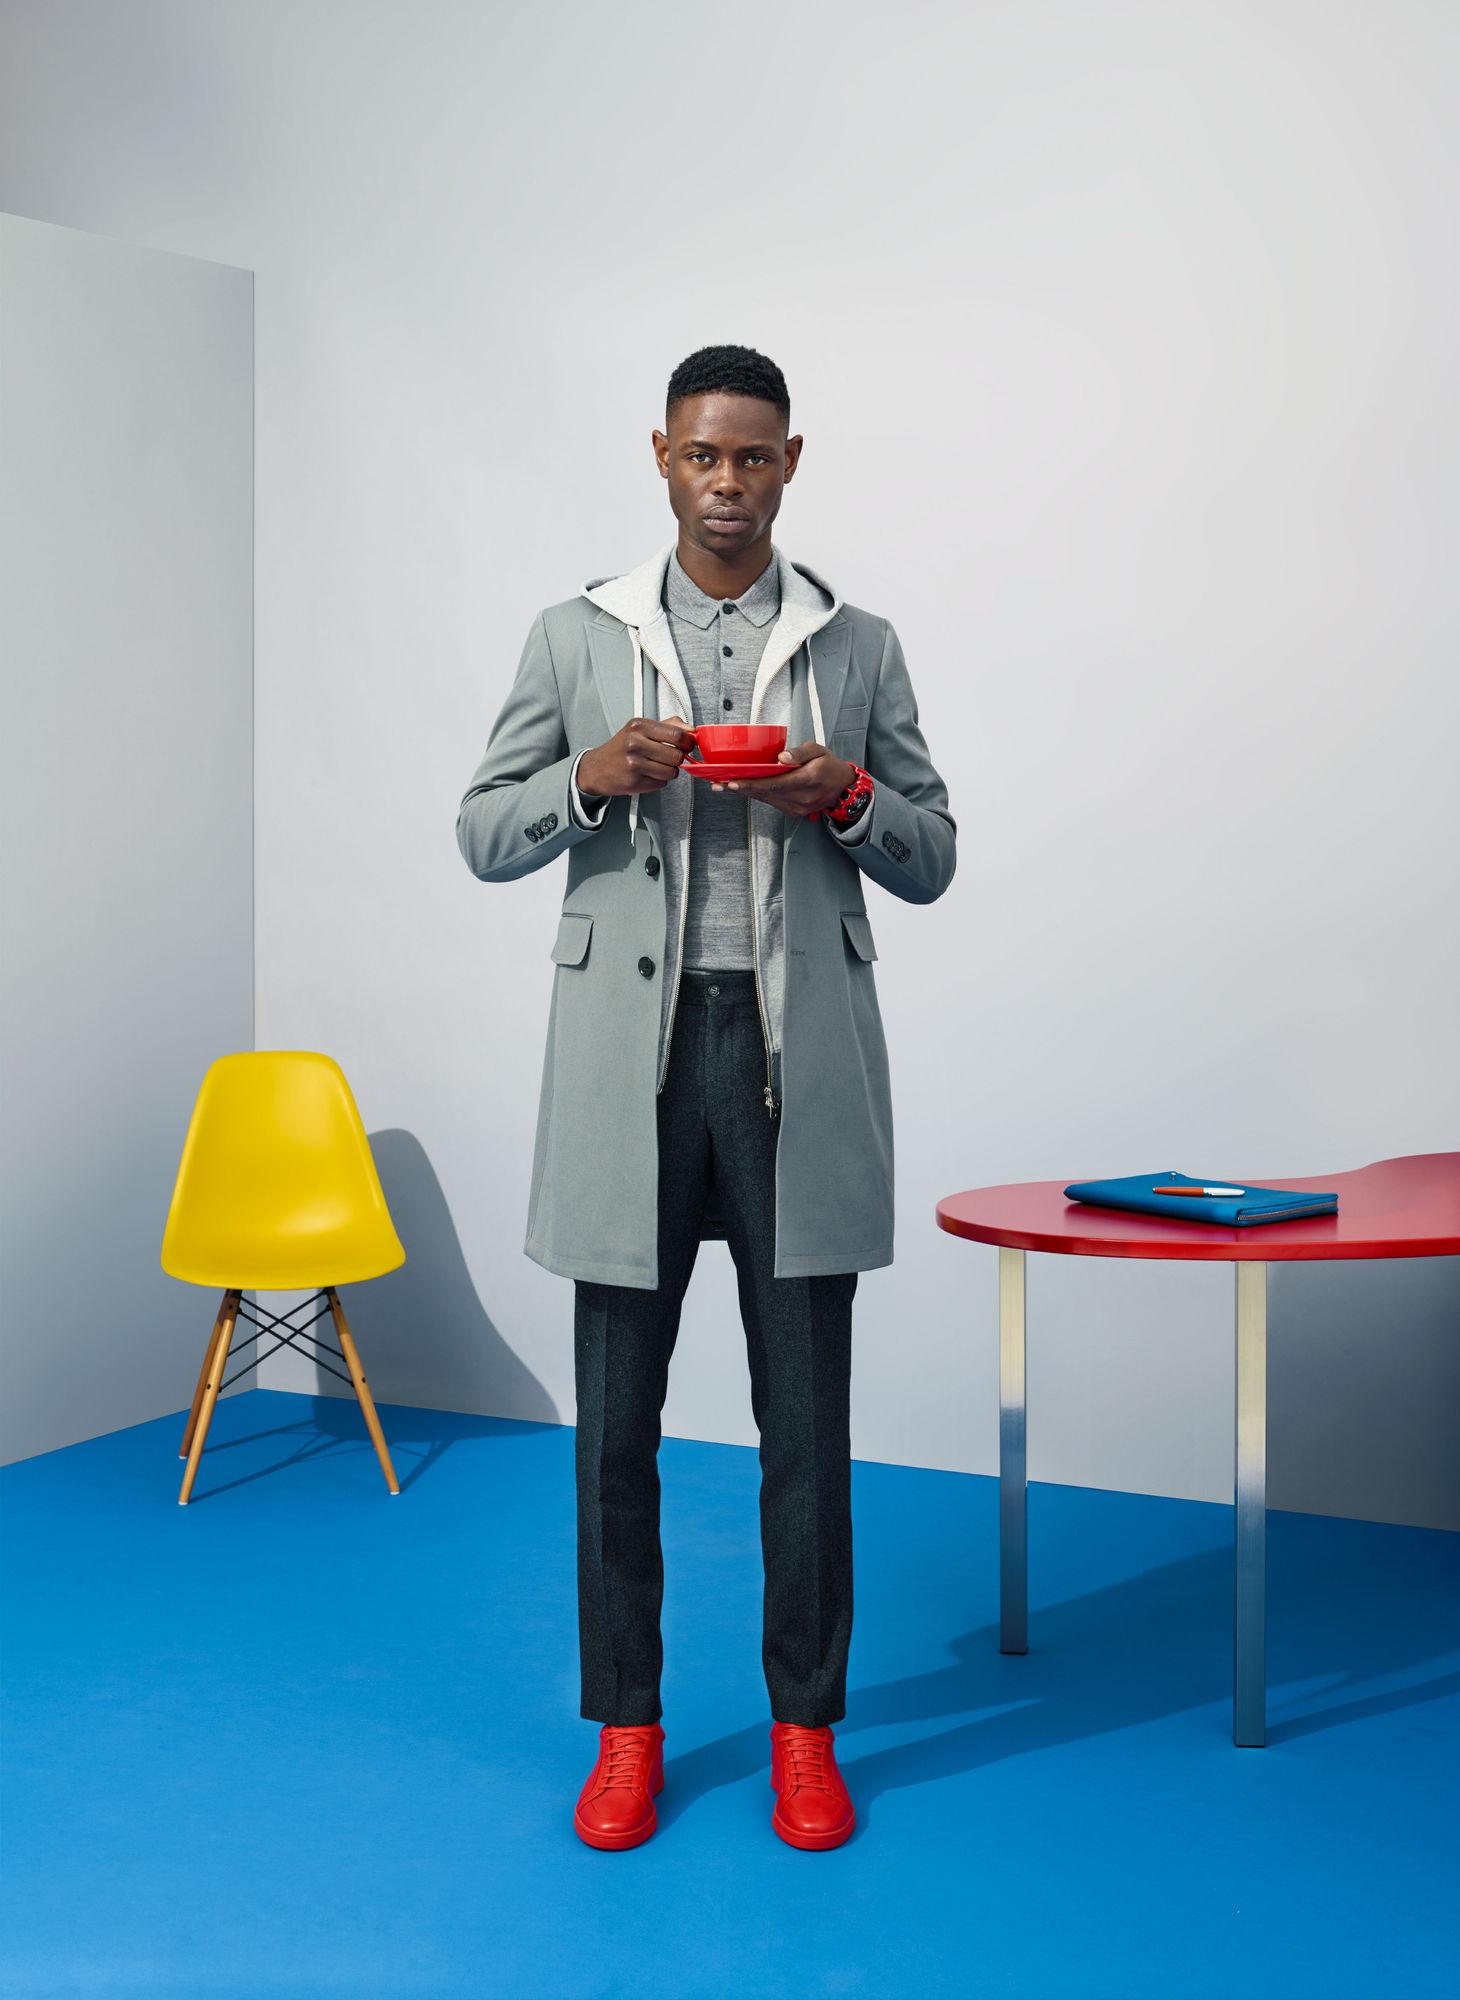 RECOM : Mens Health Best Fashion Editorial